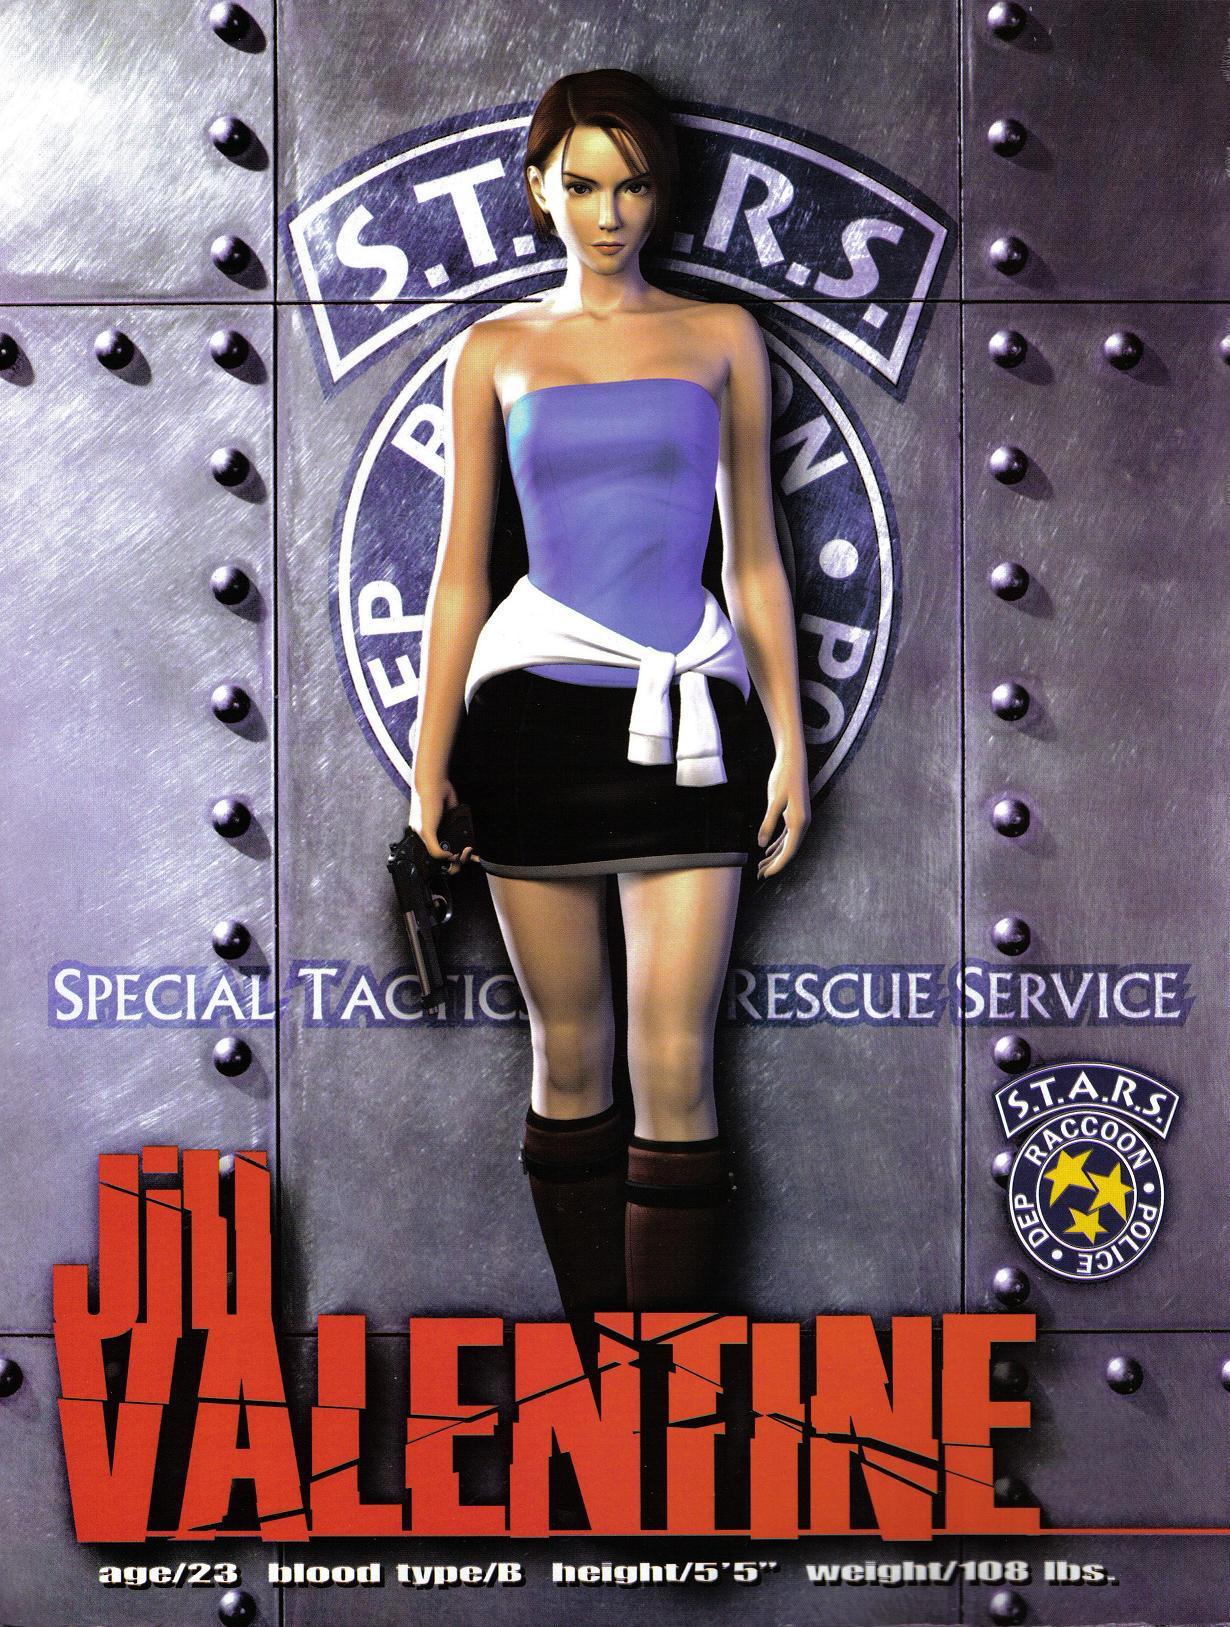 Jill Valentine (Galería) 23664